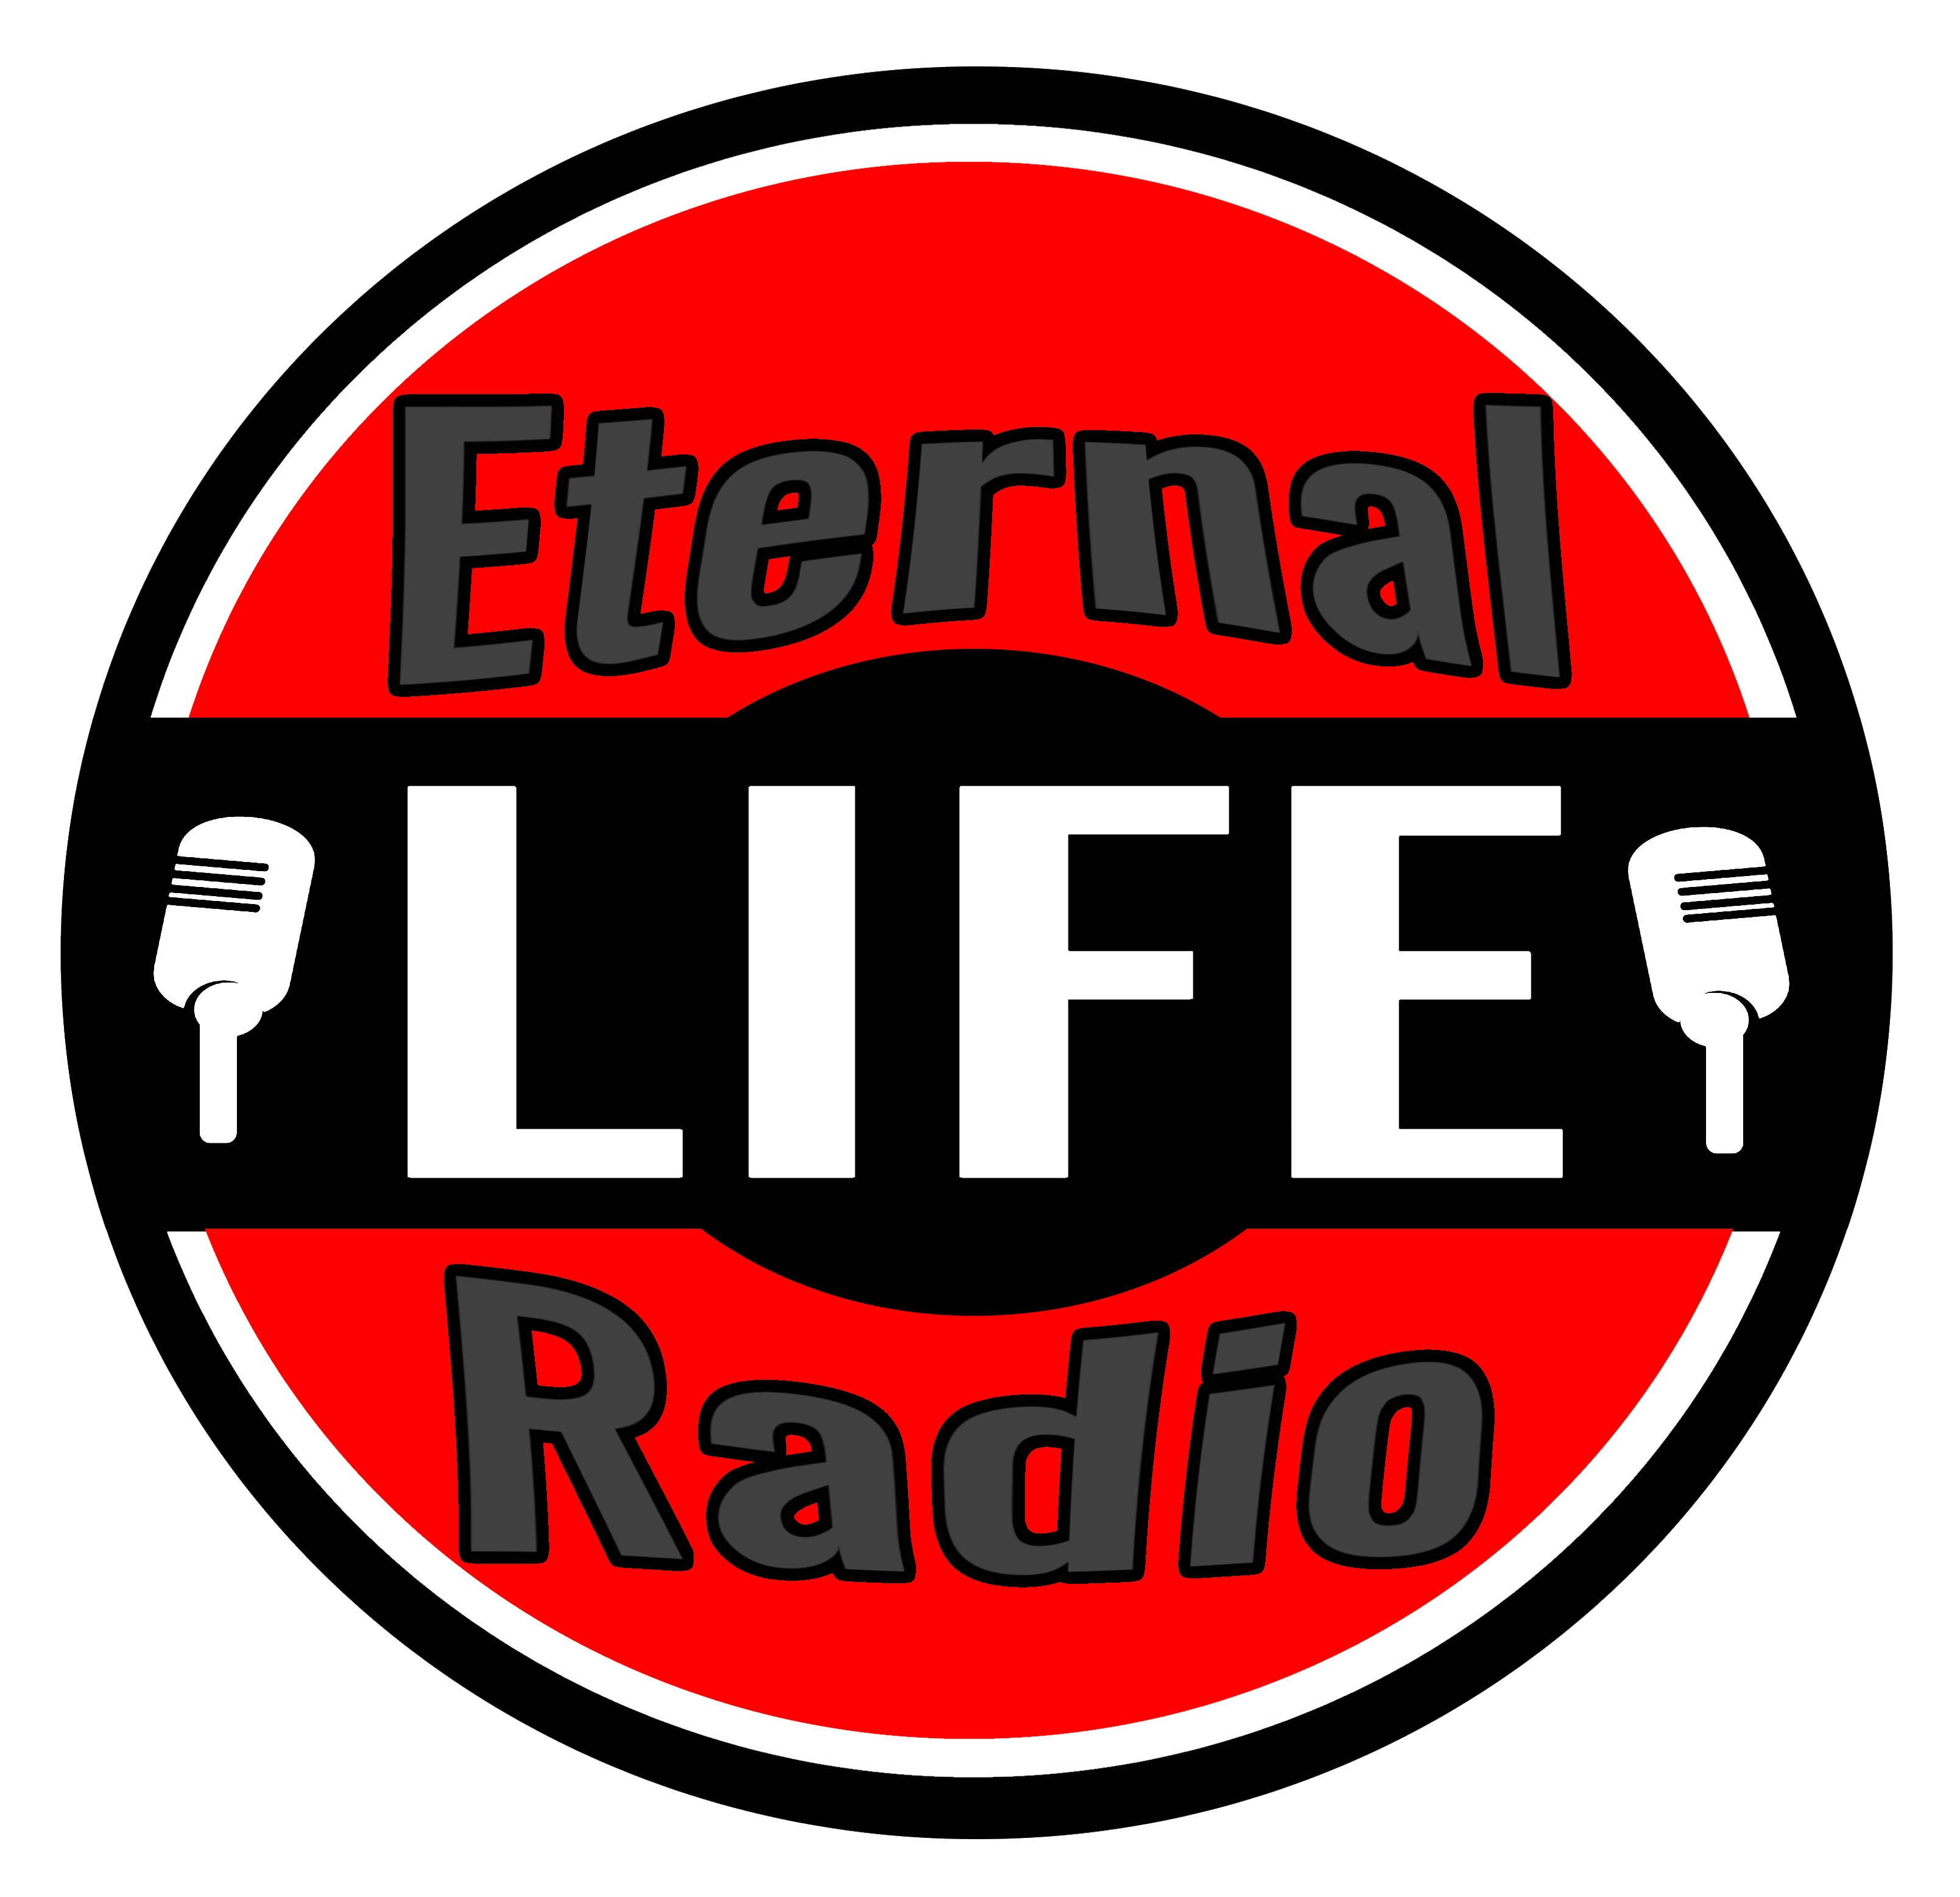 Eternal Life Radio